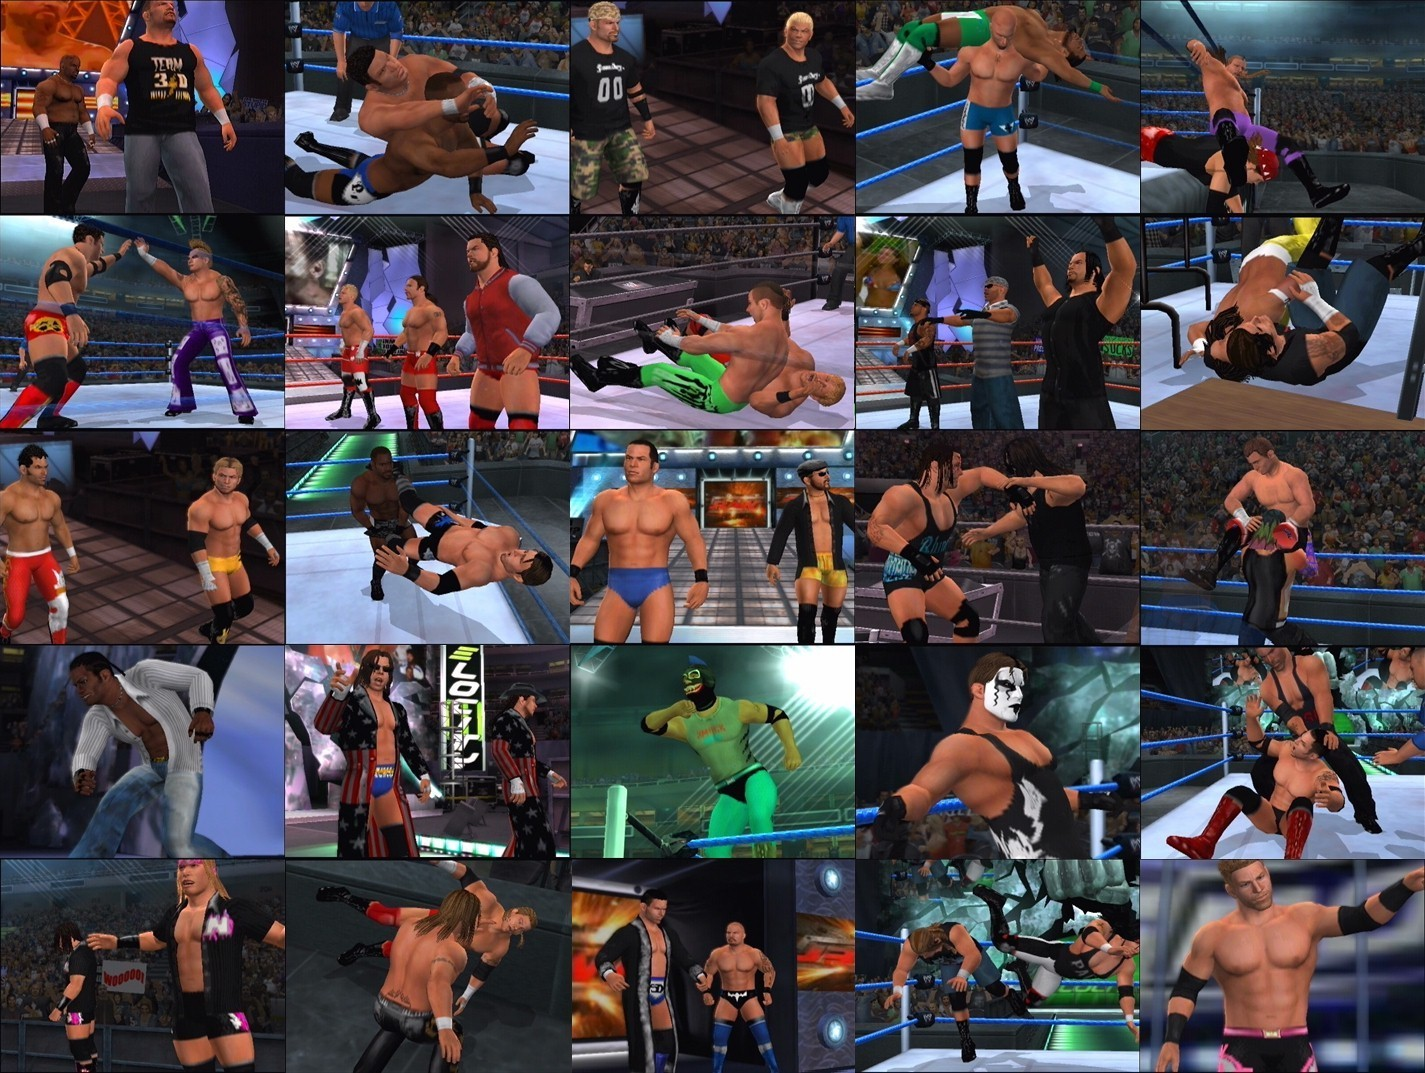 Brock Lesnar Hd Wallpaper Smackdown Vs Raw Caws Images Caws Hd Wallpaper And